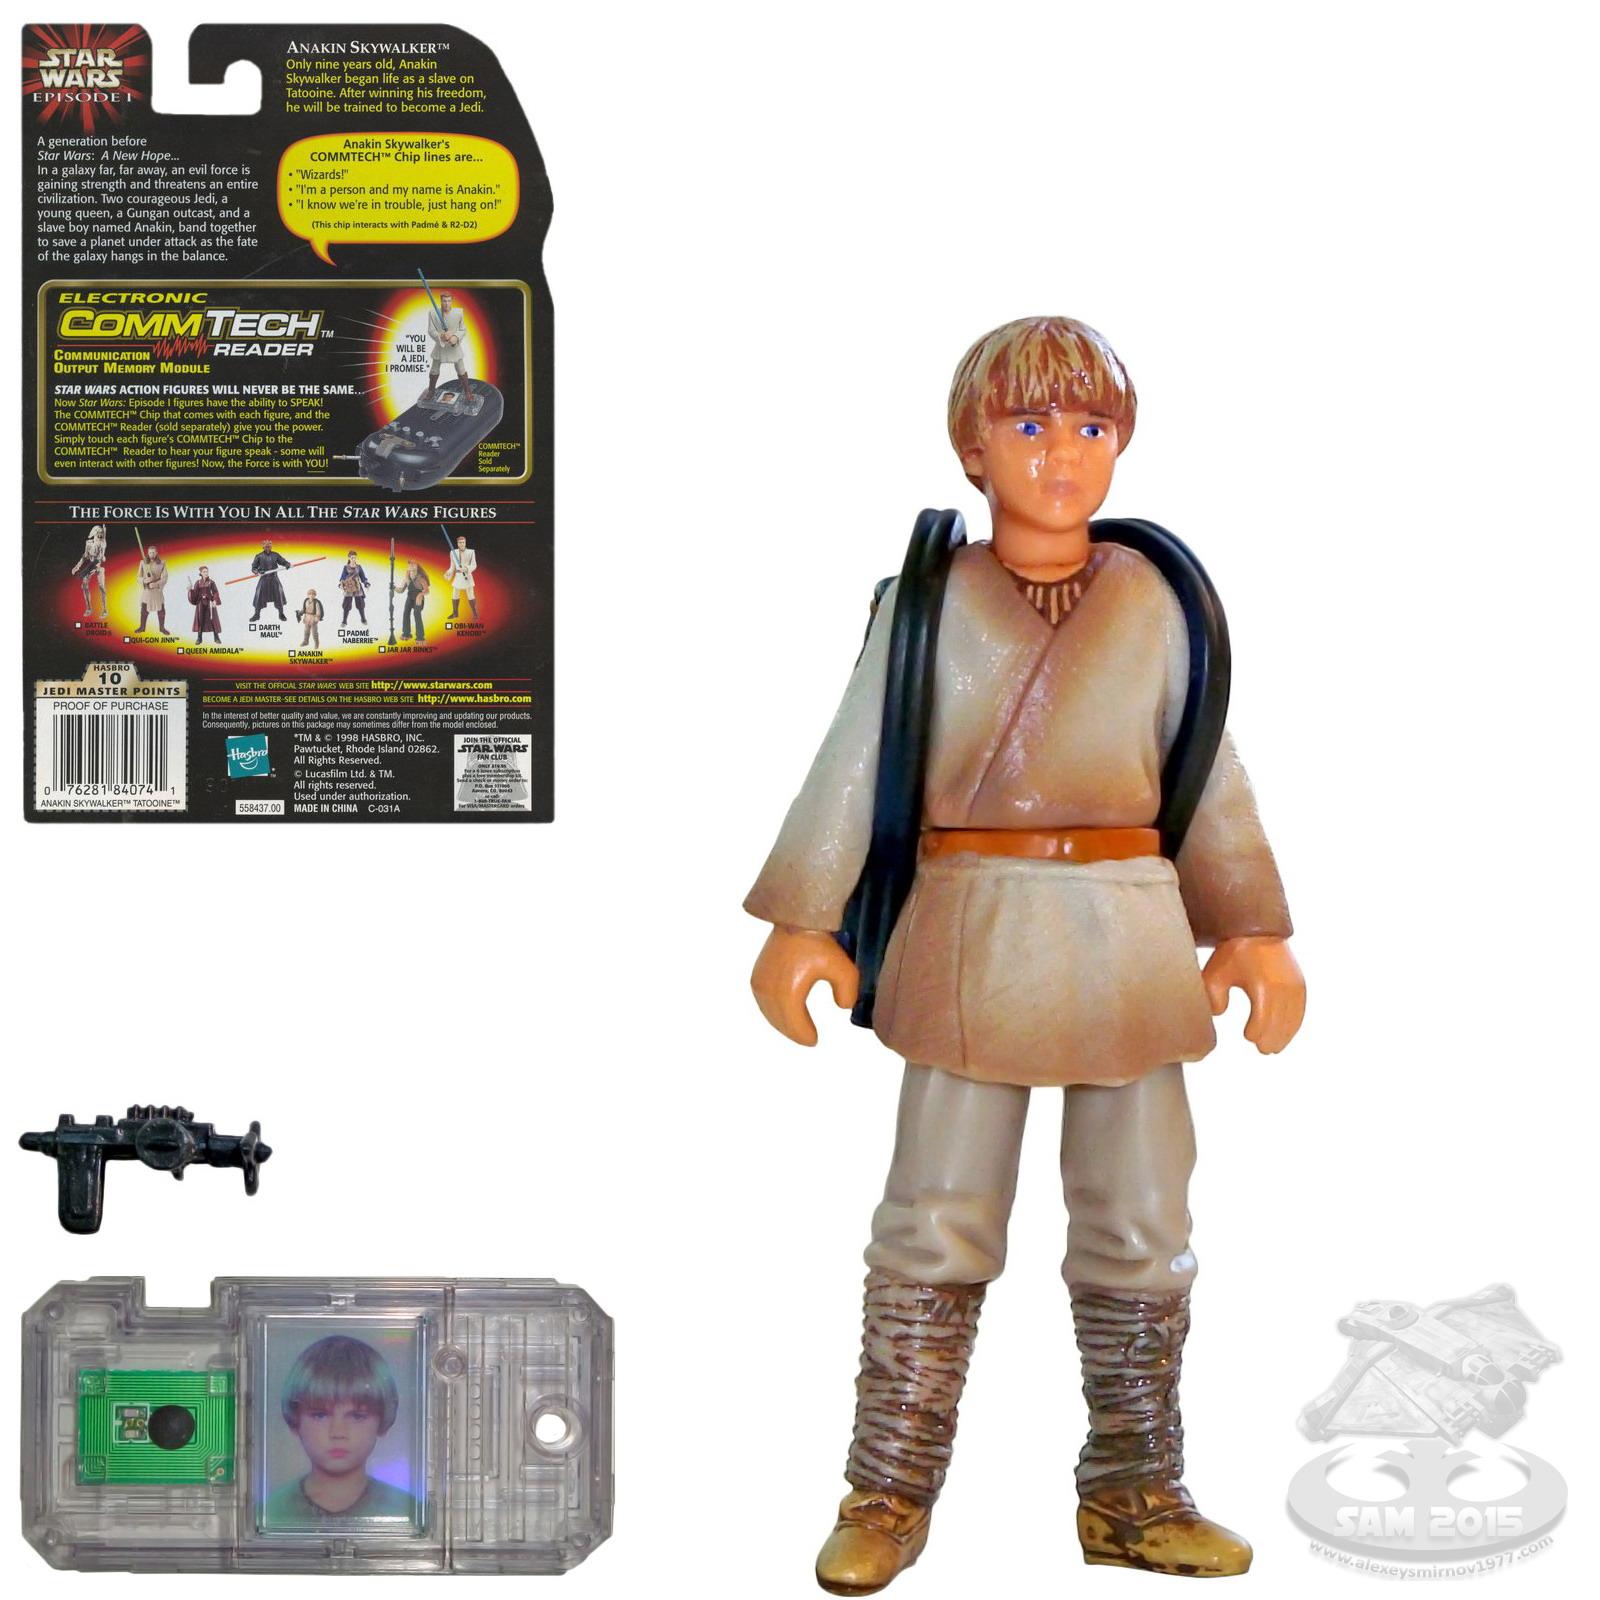 STAR WARS EPISODIO 1 Anakin Skywalker Pilota NABOO Figura commtech Chip in massa